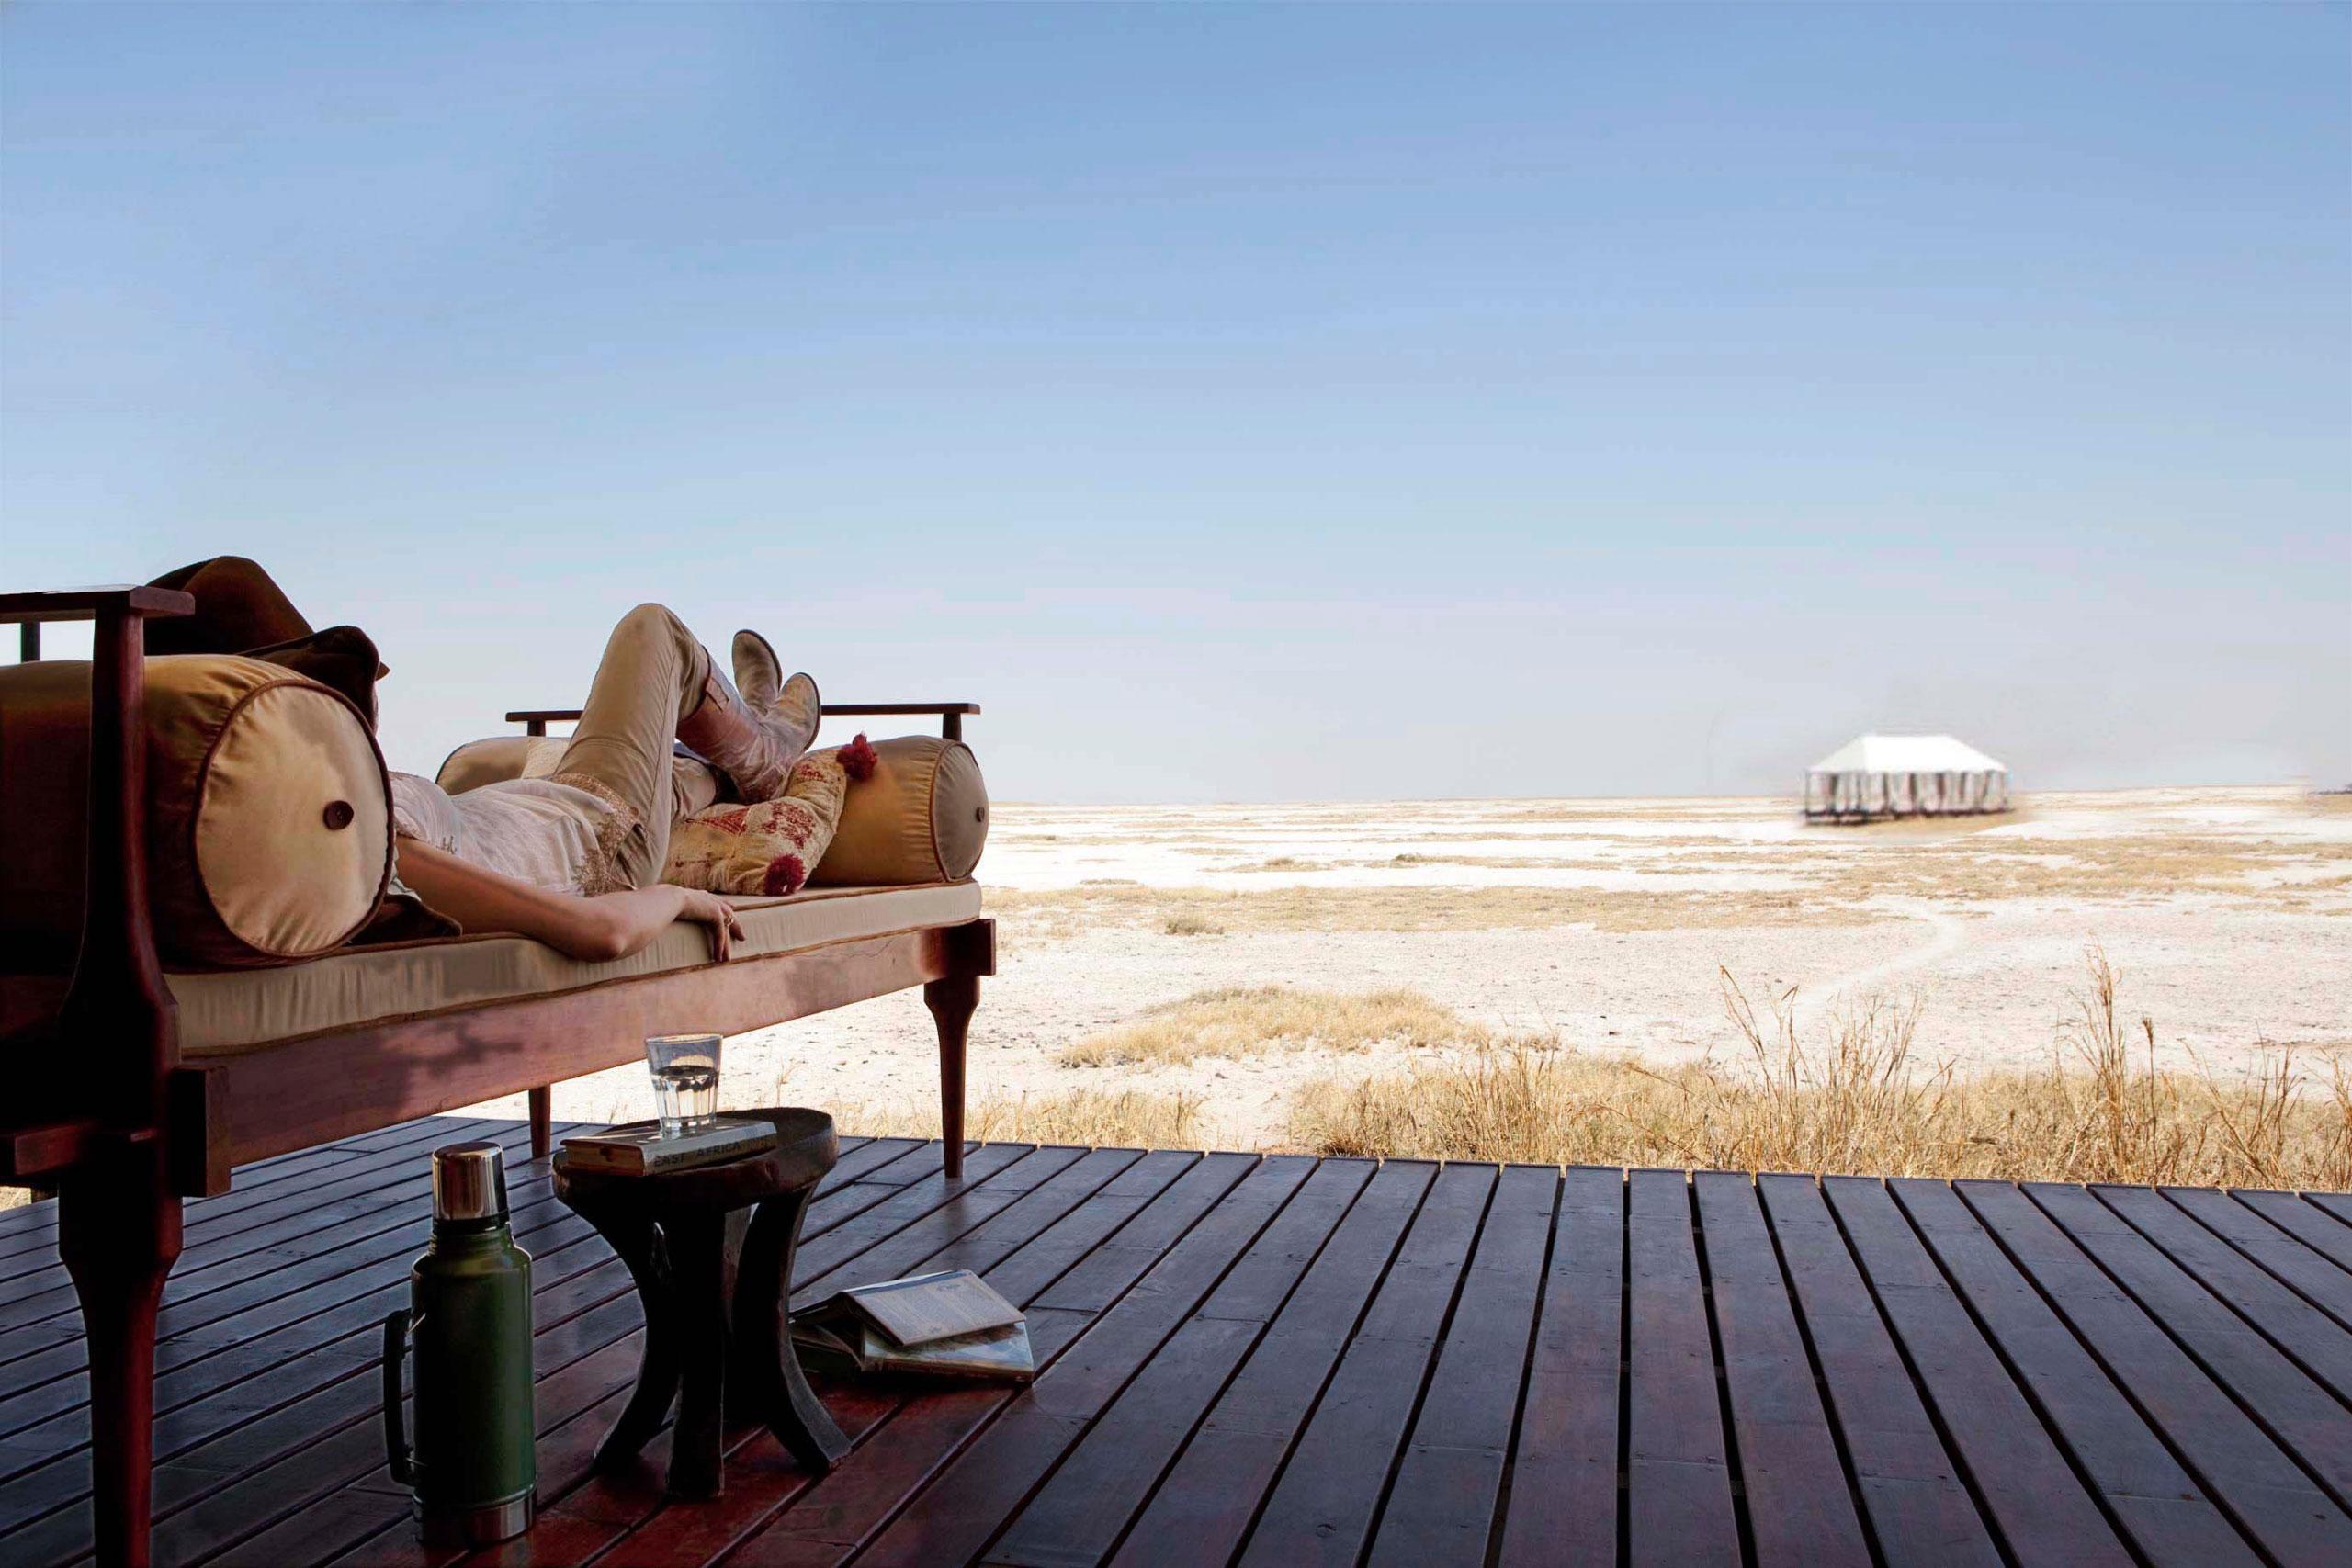 Uncharted San Camp Magkadikgadi Pans Botswana view enkosi africa Campamento mejores Vistas África